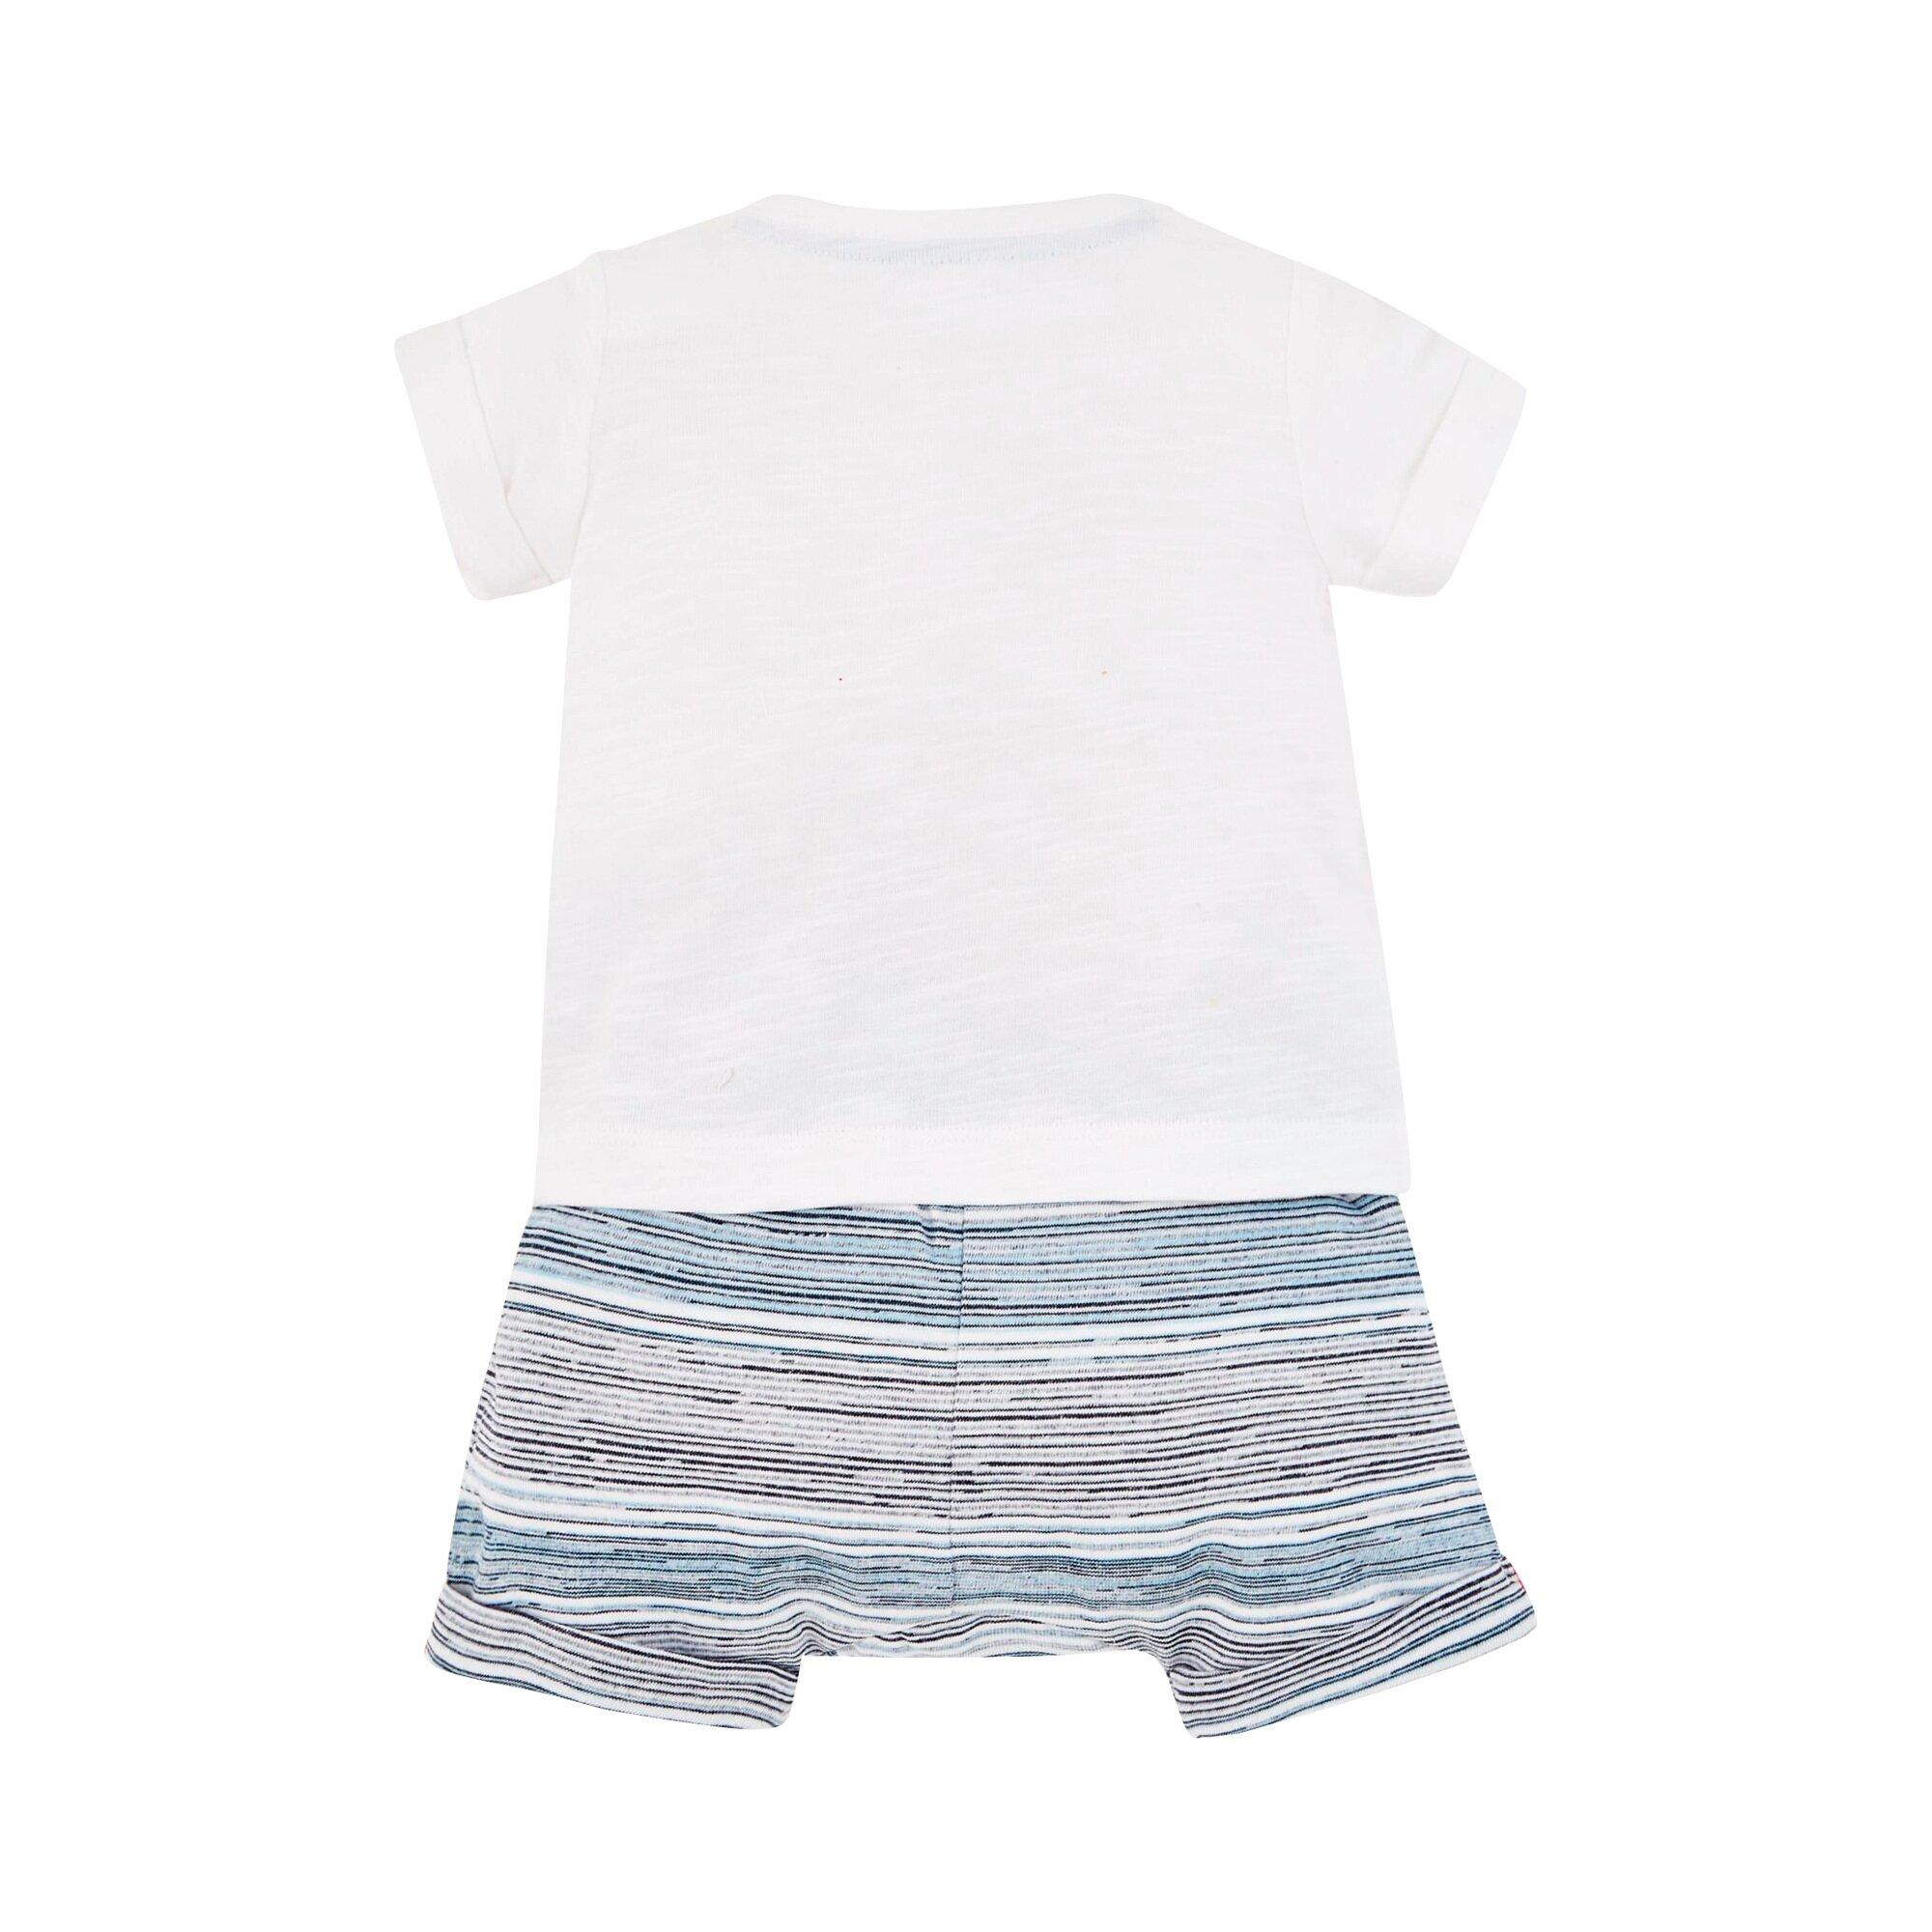 mothercare-2-tlg-set-shorts-und-t-shirt-krabbe